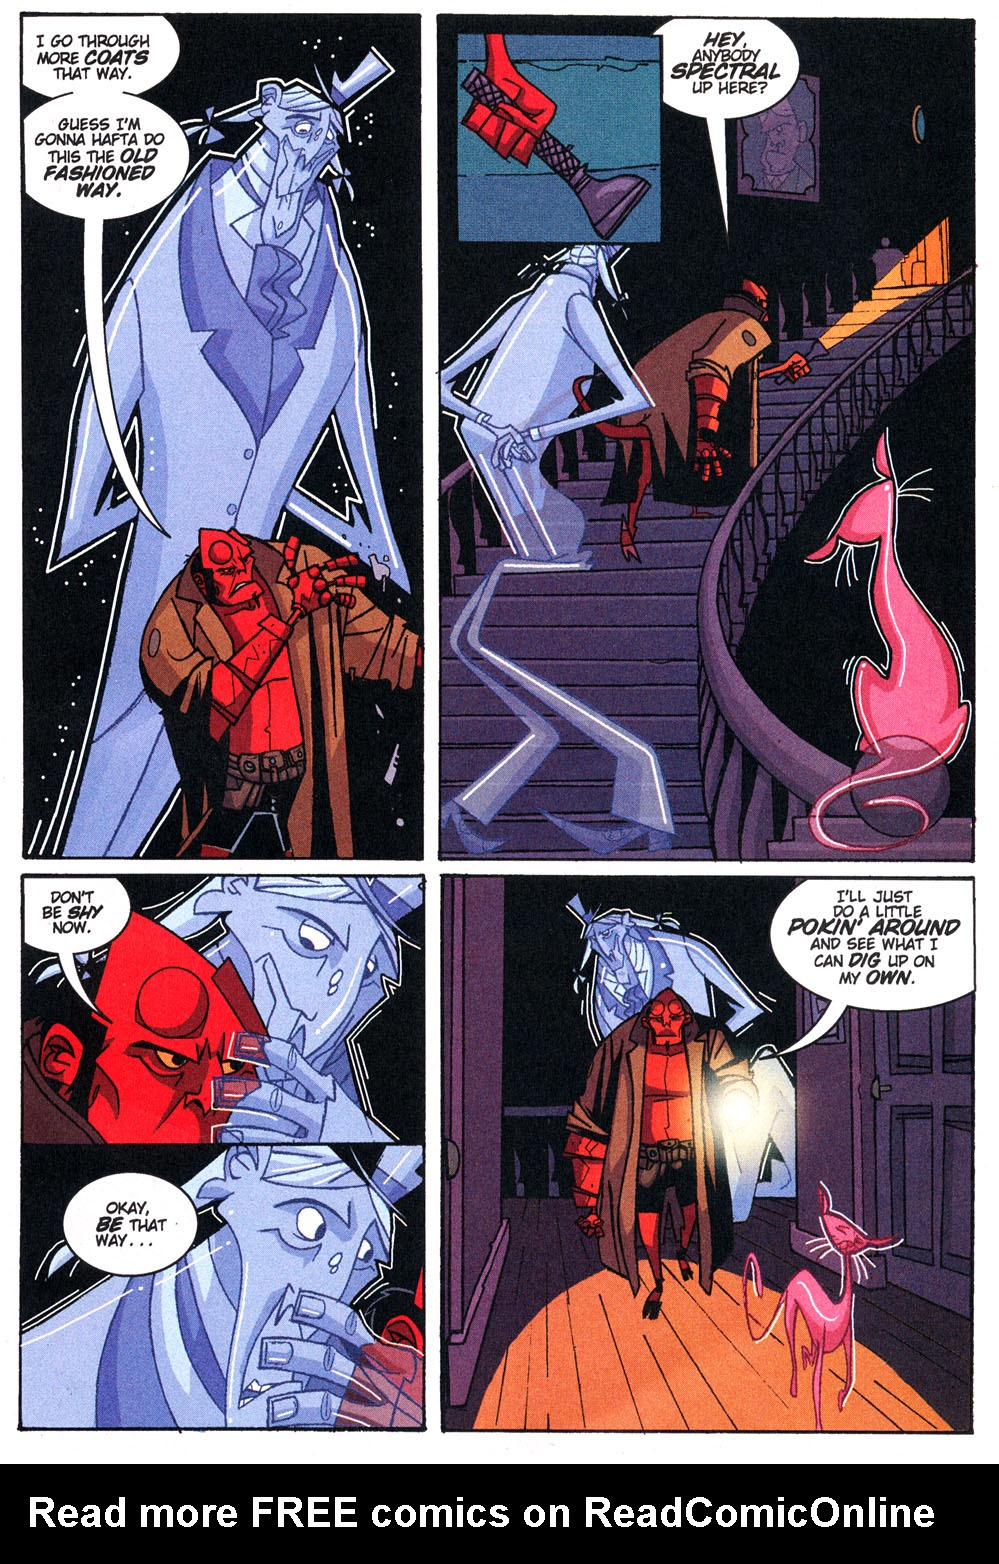 Read online Hellboy: Weird Tales comic -  Issue #4 - 24